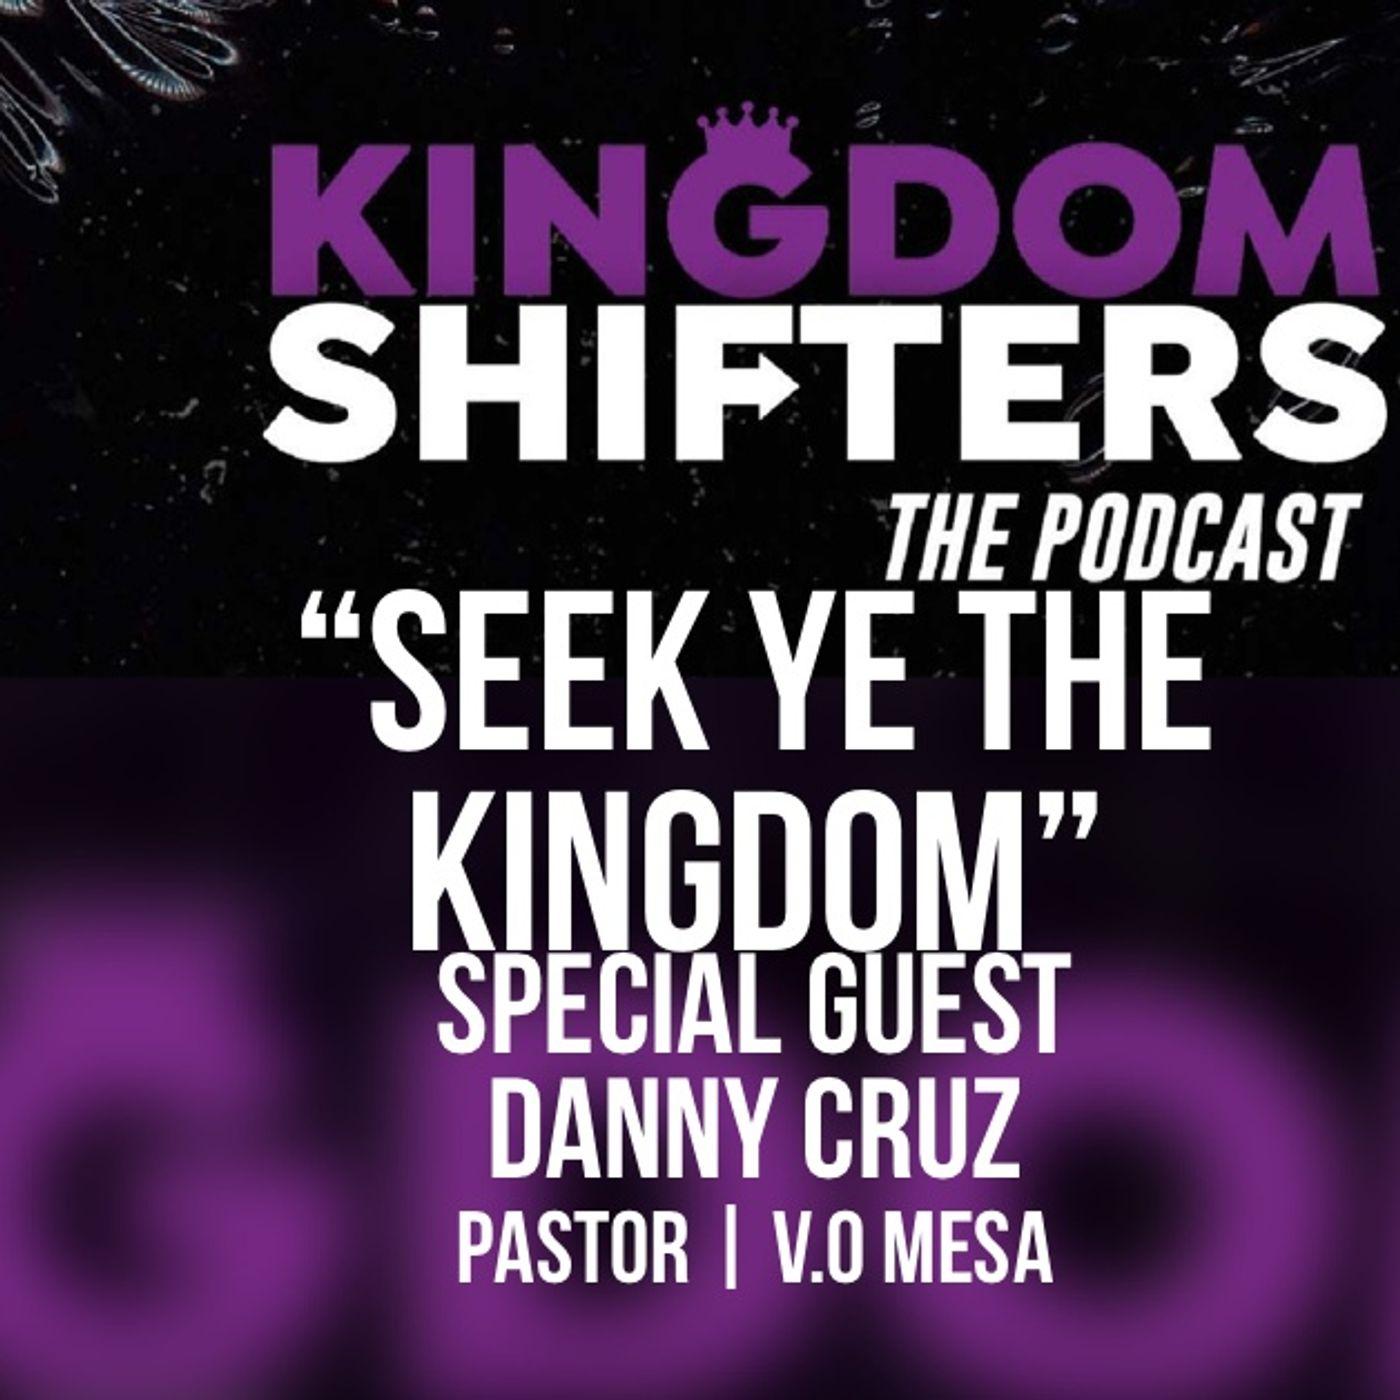 Kingdom Shifters The Podcast : Kingdom Priority | Guest Pastor Danny Cruz